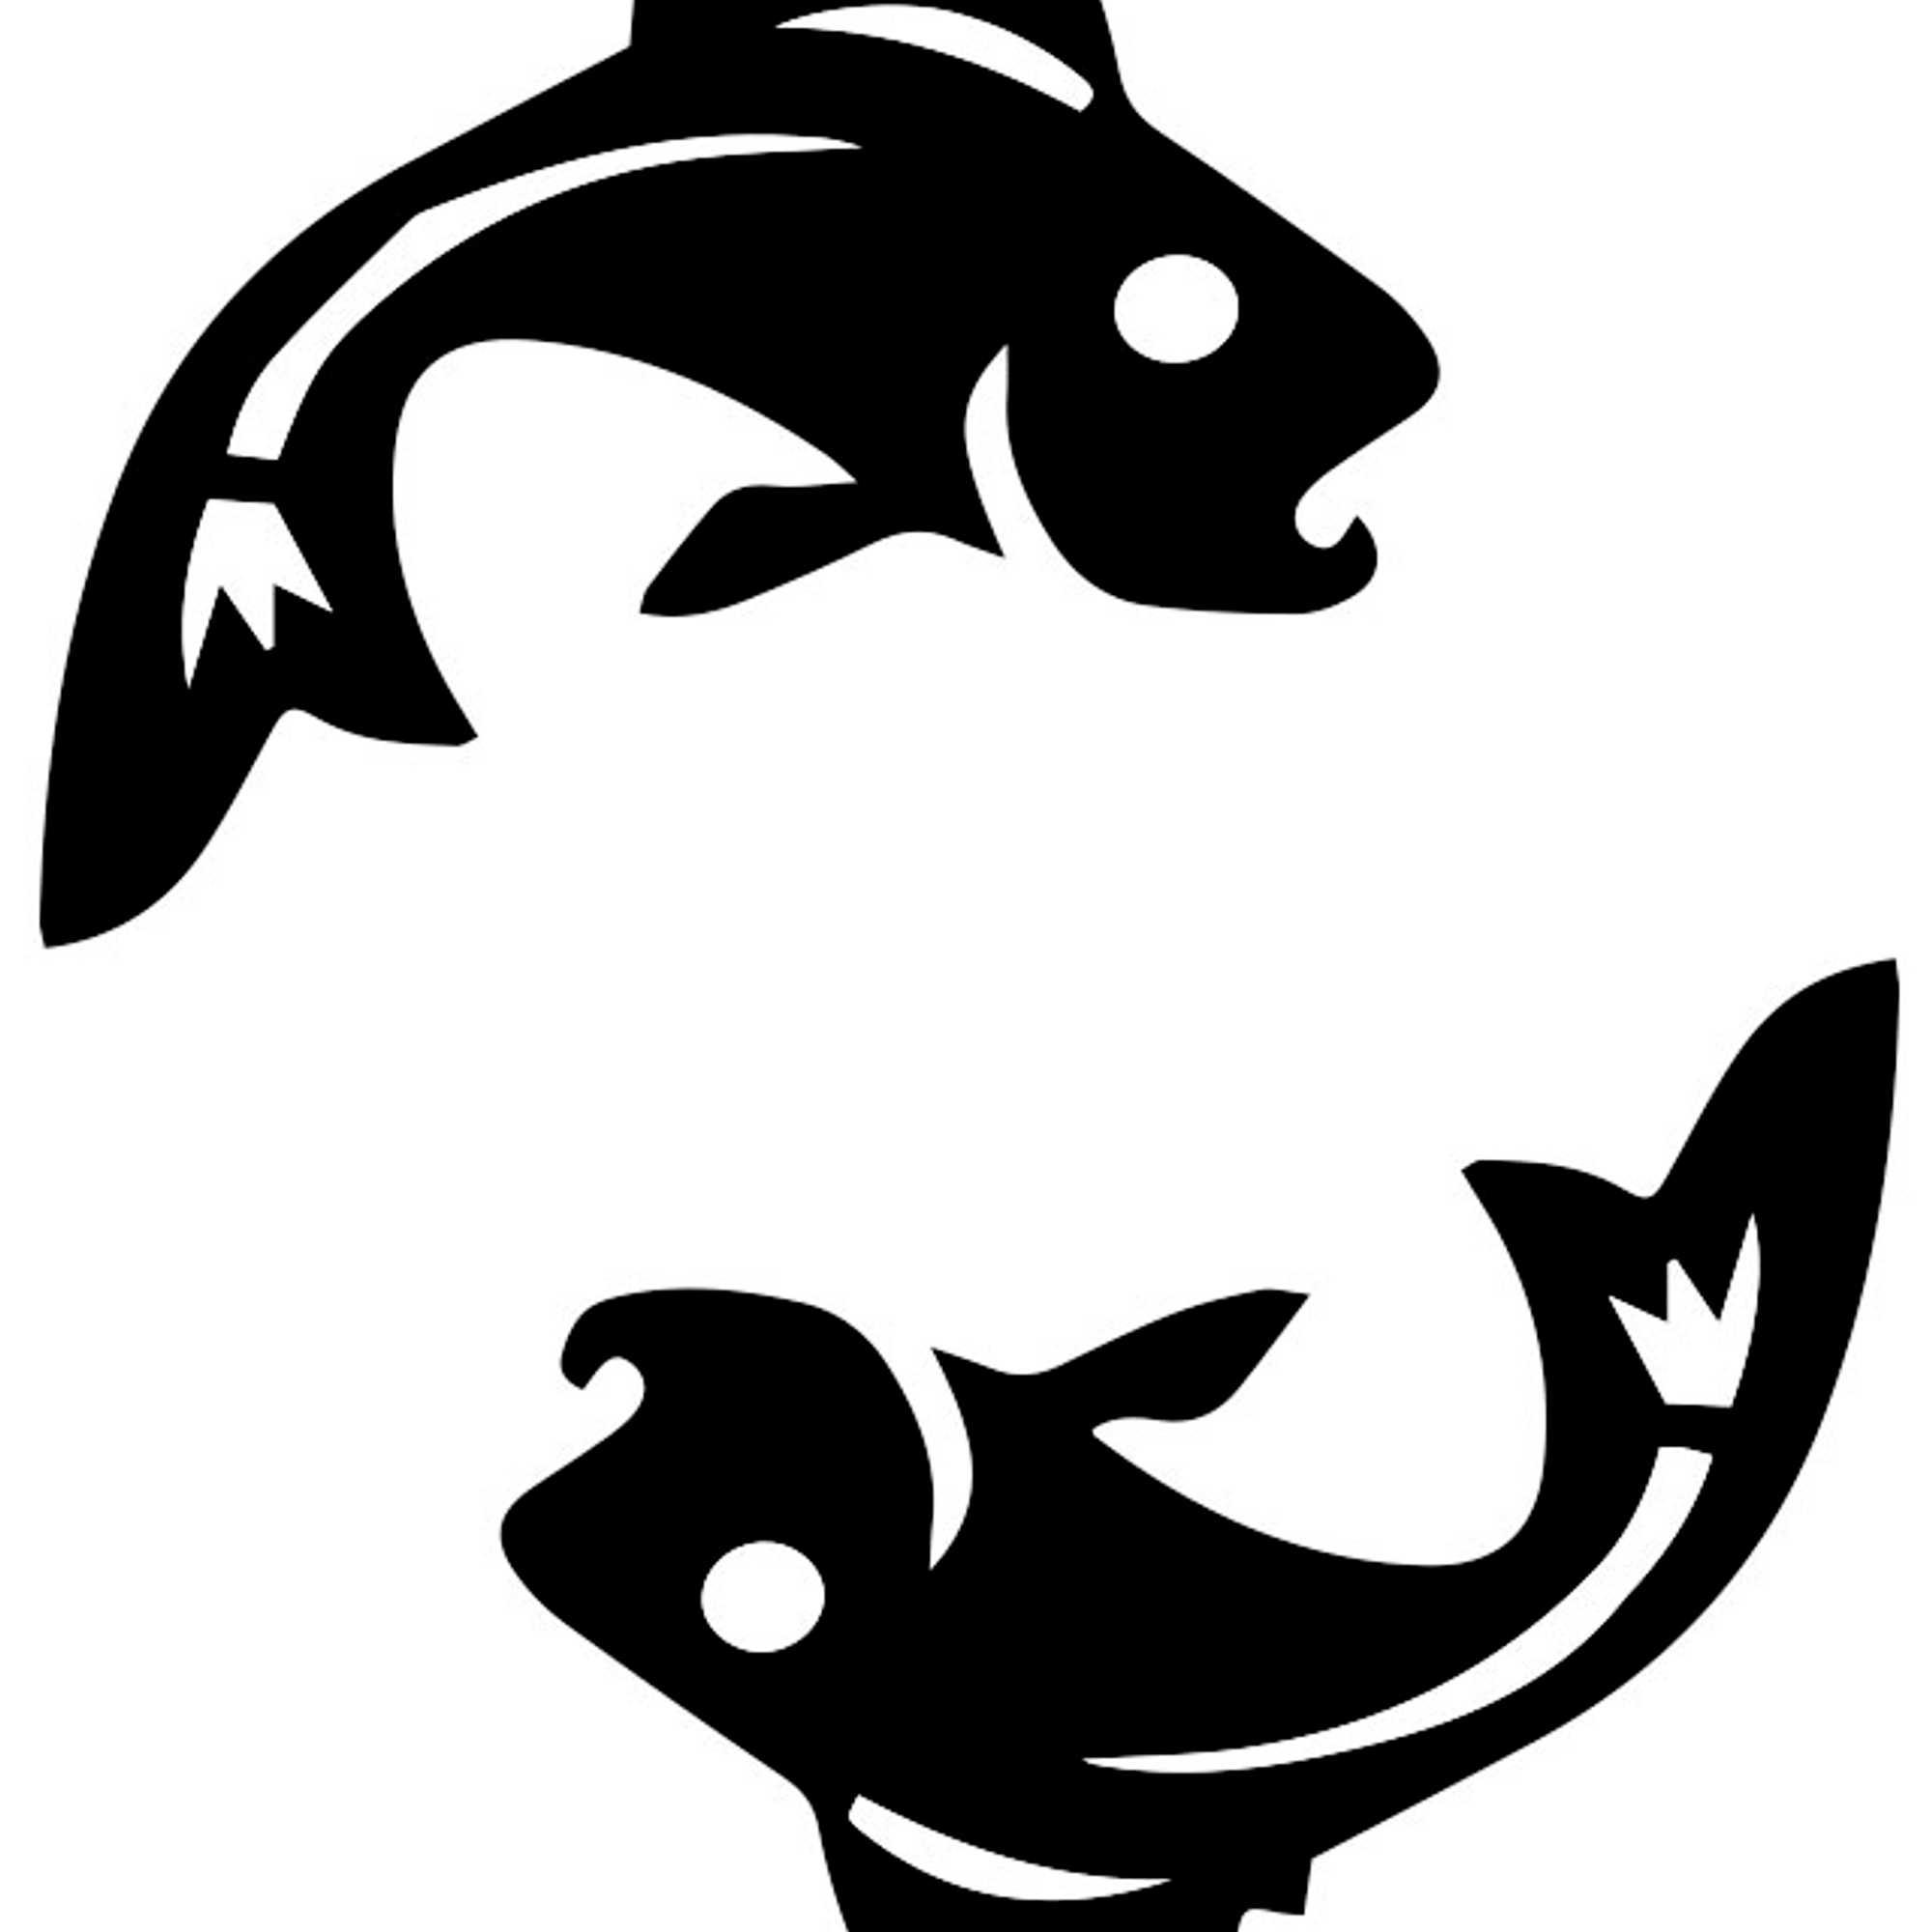 kalat ja rapu